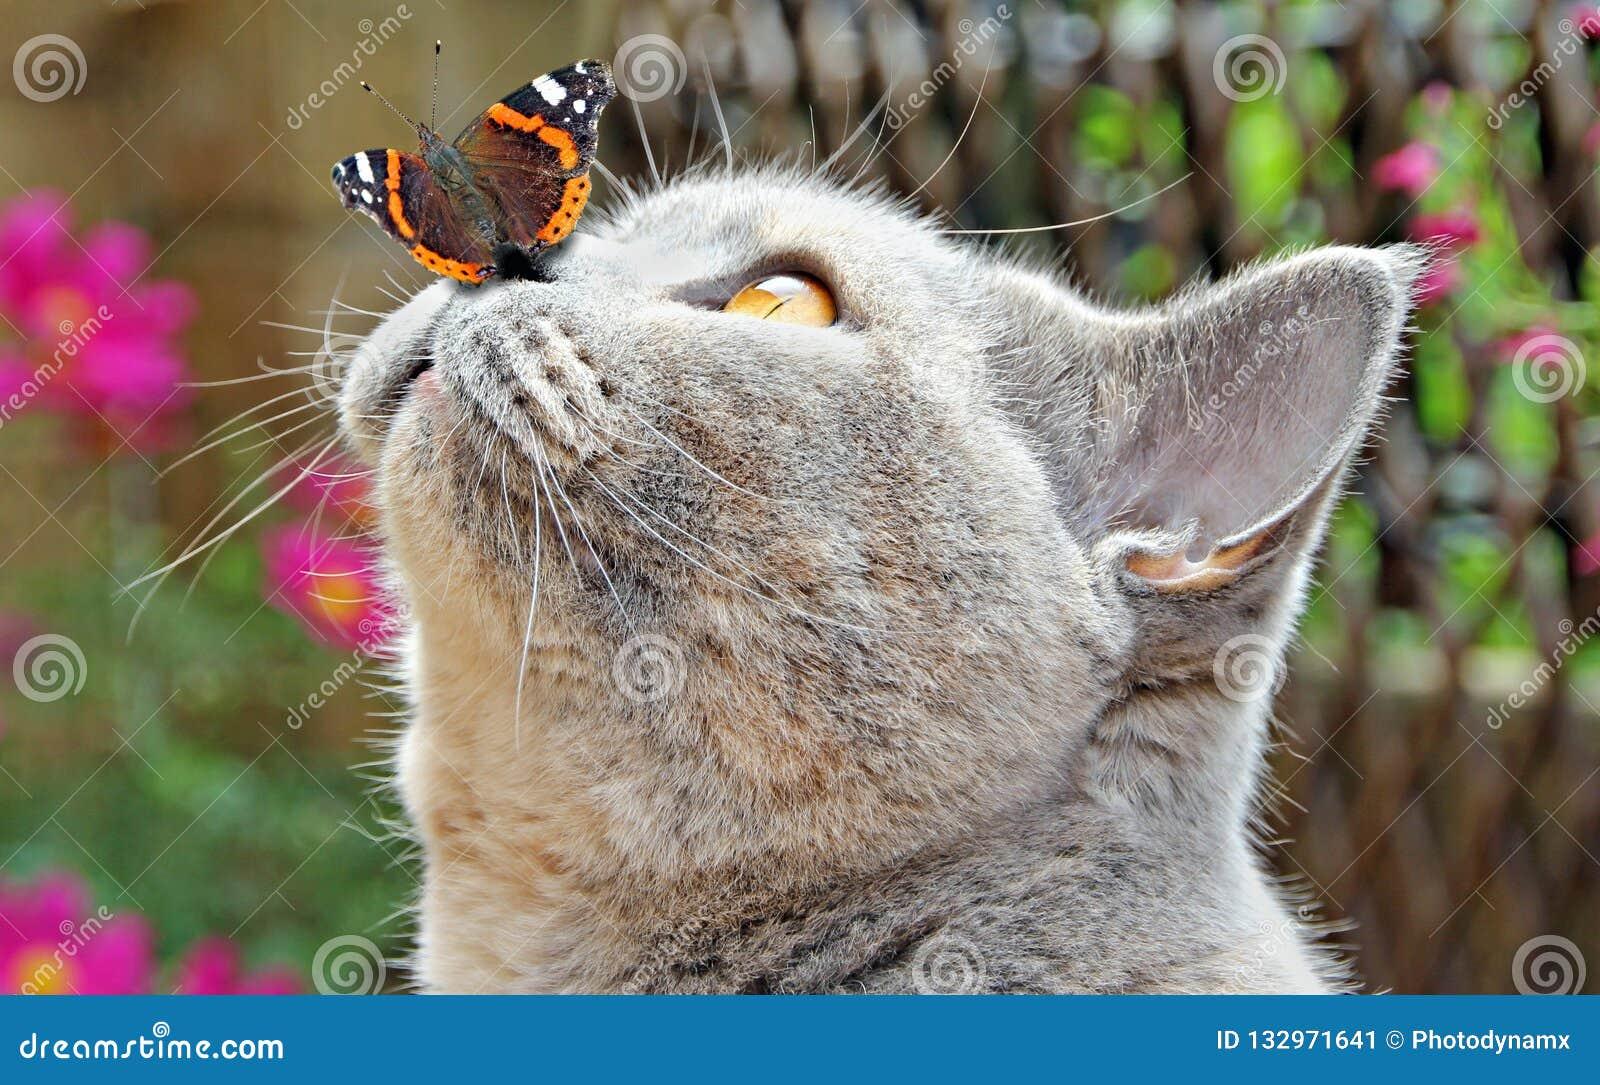 Garden friends butterfly on nose of cat